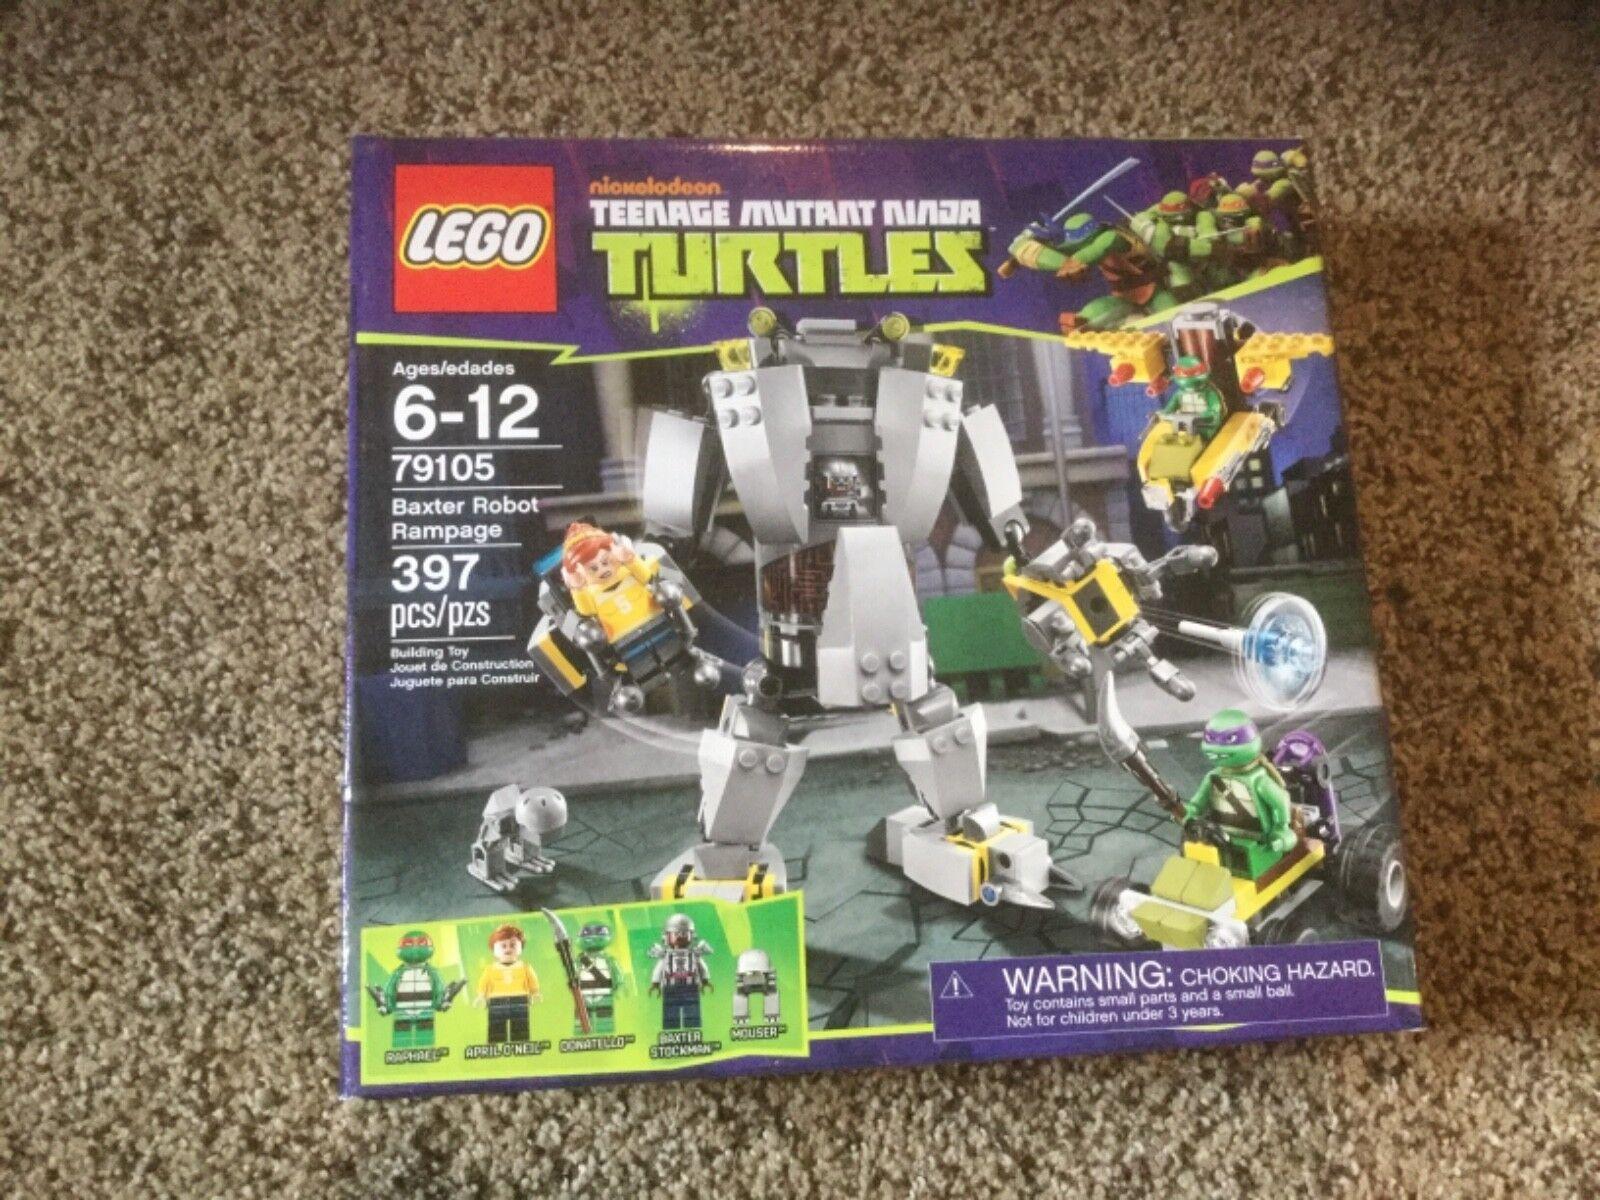 NIB Lego Baxter Robot Rampage (79105) Teenage Mutent Ninja Turtles.